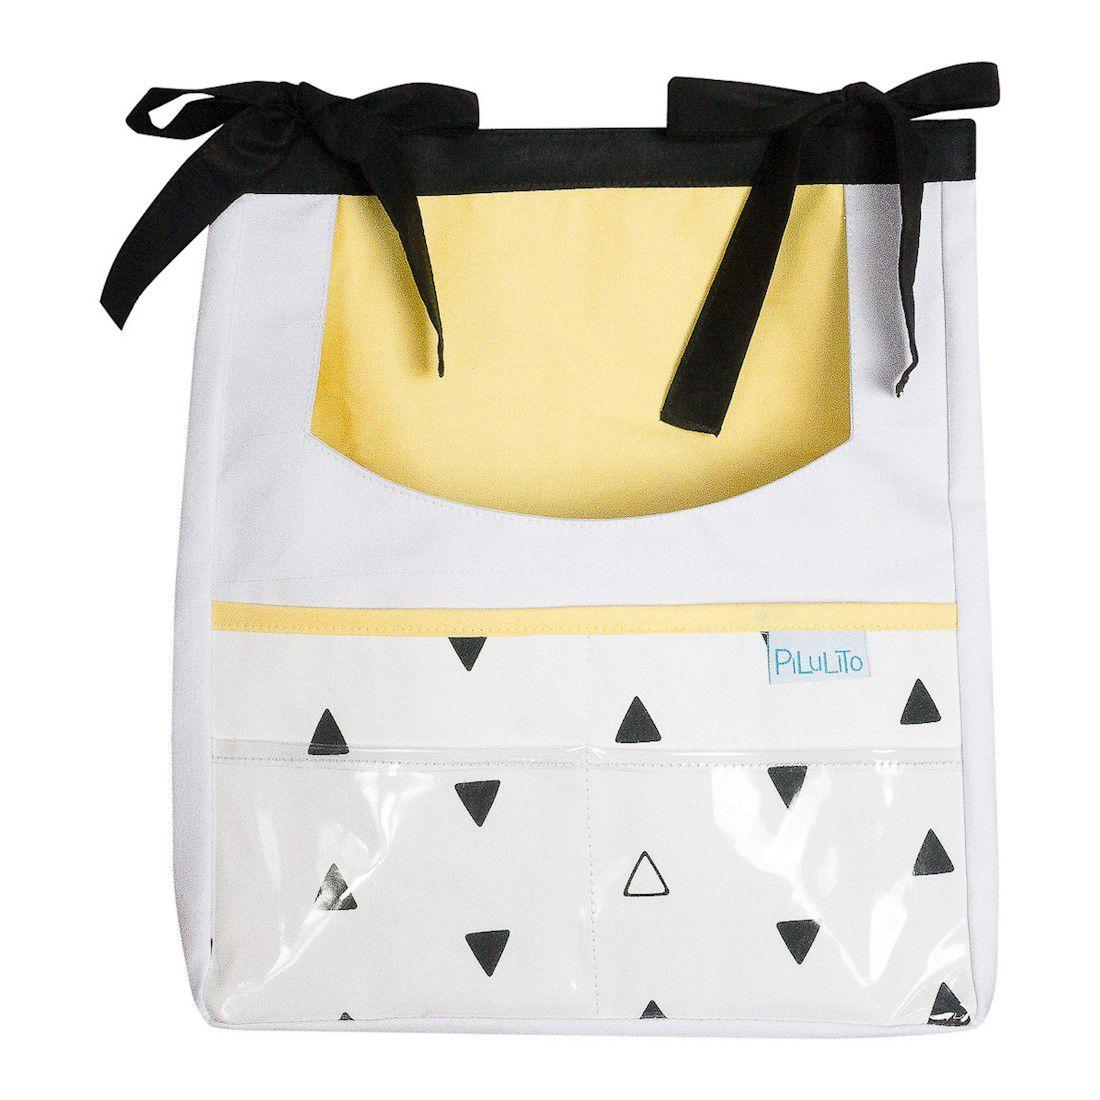 Porta-trecos triângulos PB com amarelo claro